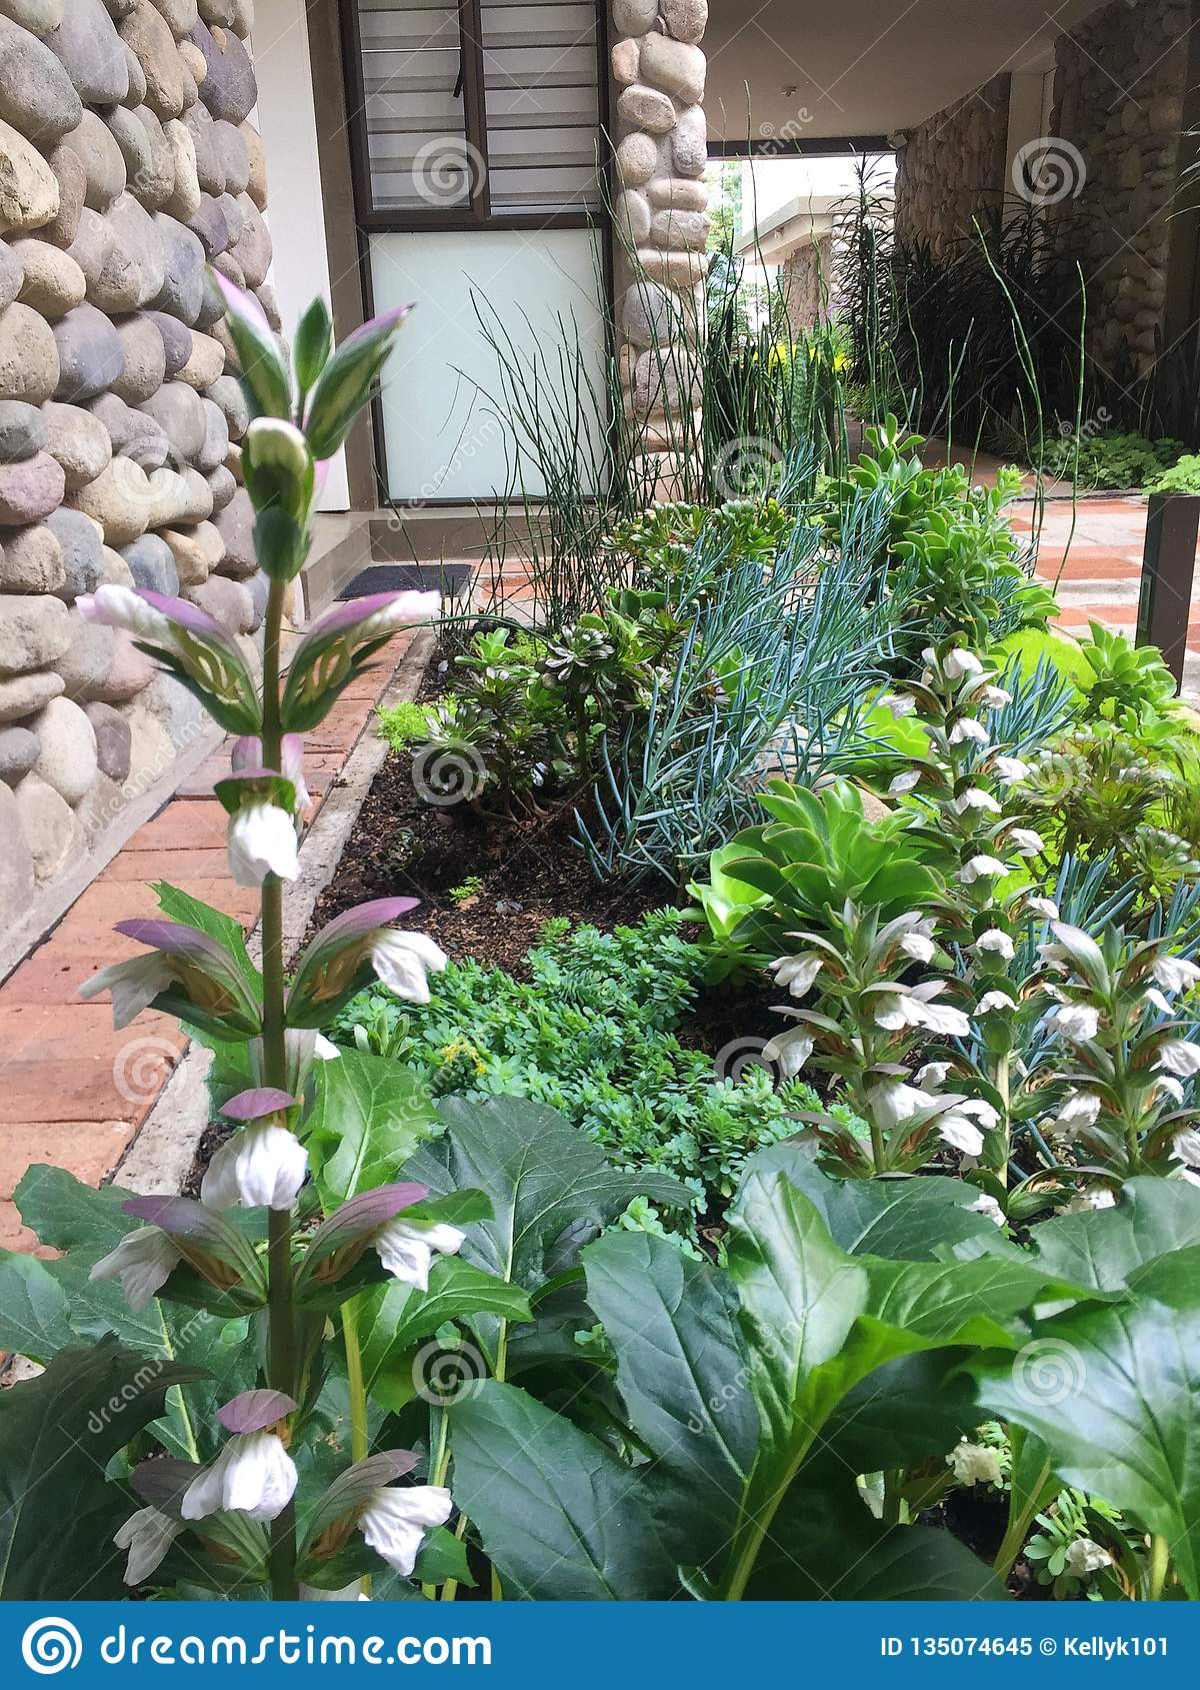 Modern Garden Landscape Design Stock Image - Image of cobblestone